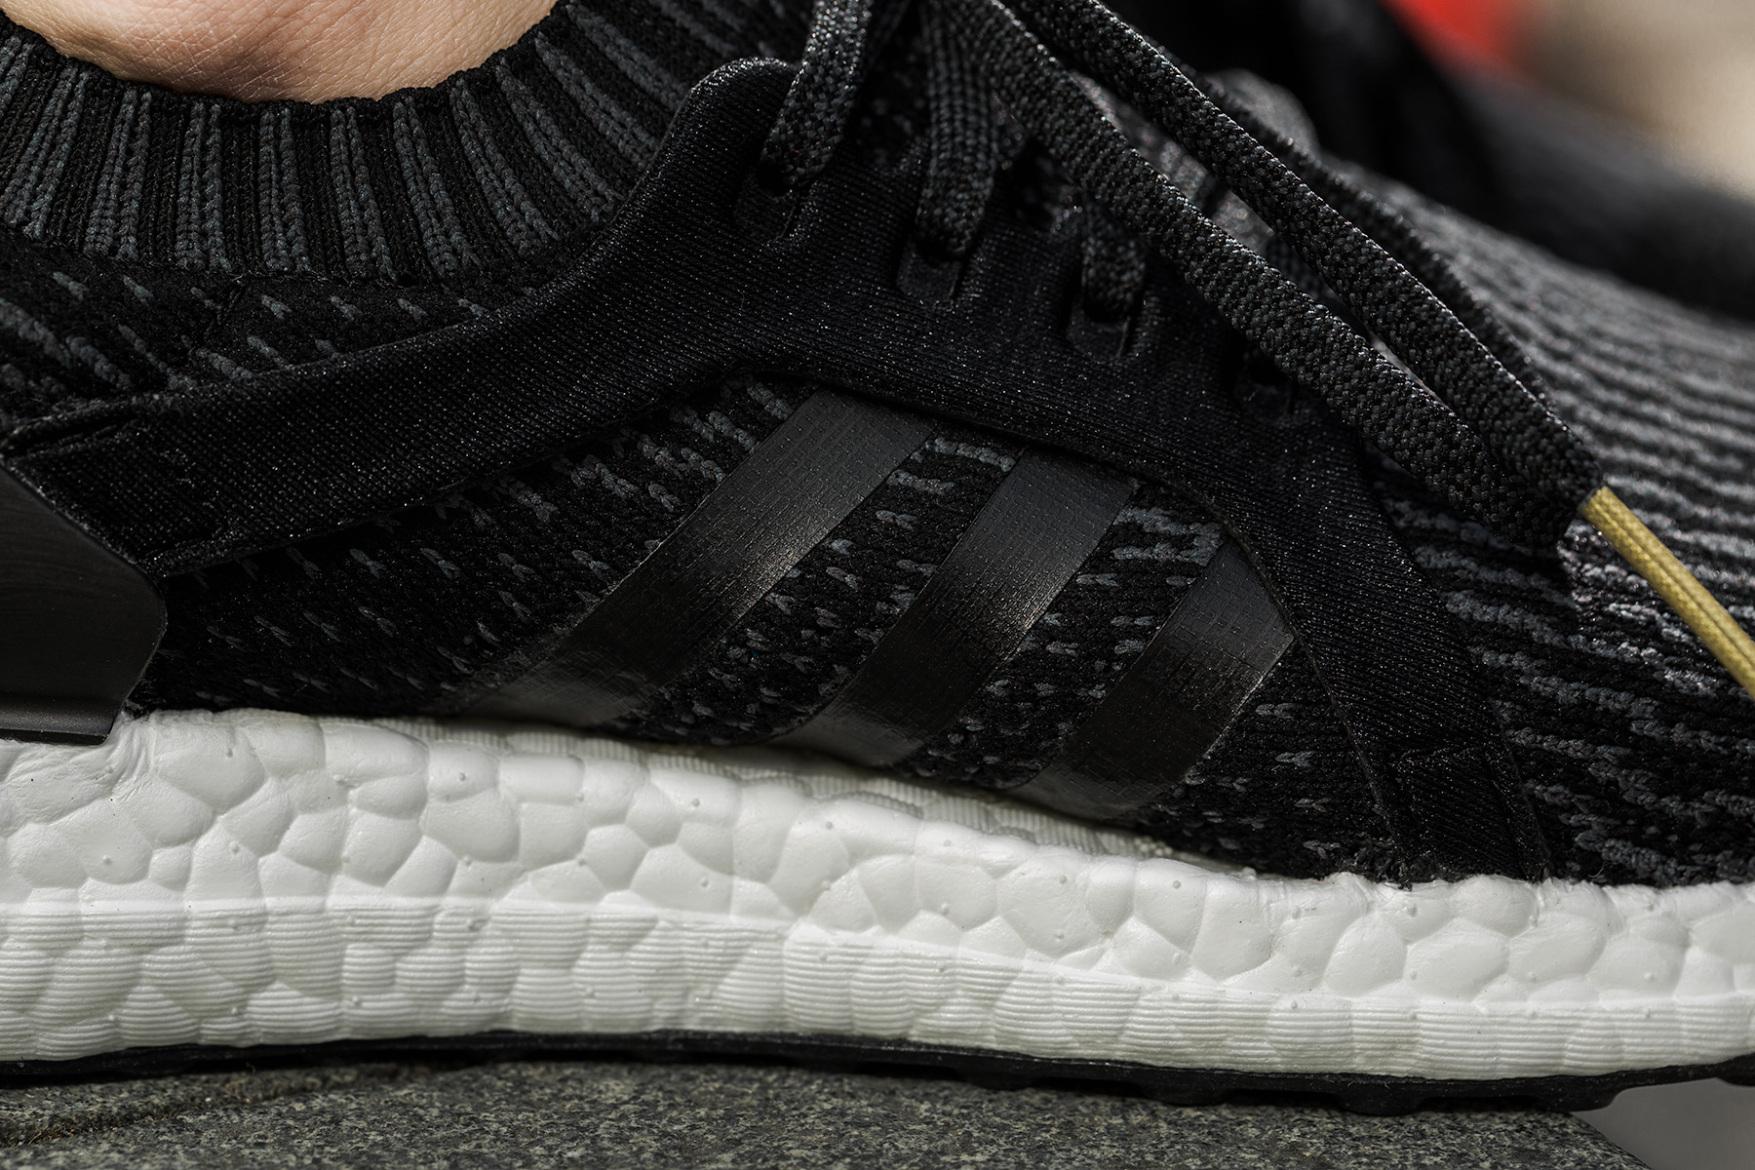 adidas ultraboost x closer look - 92563